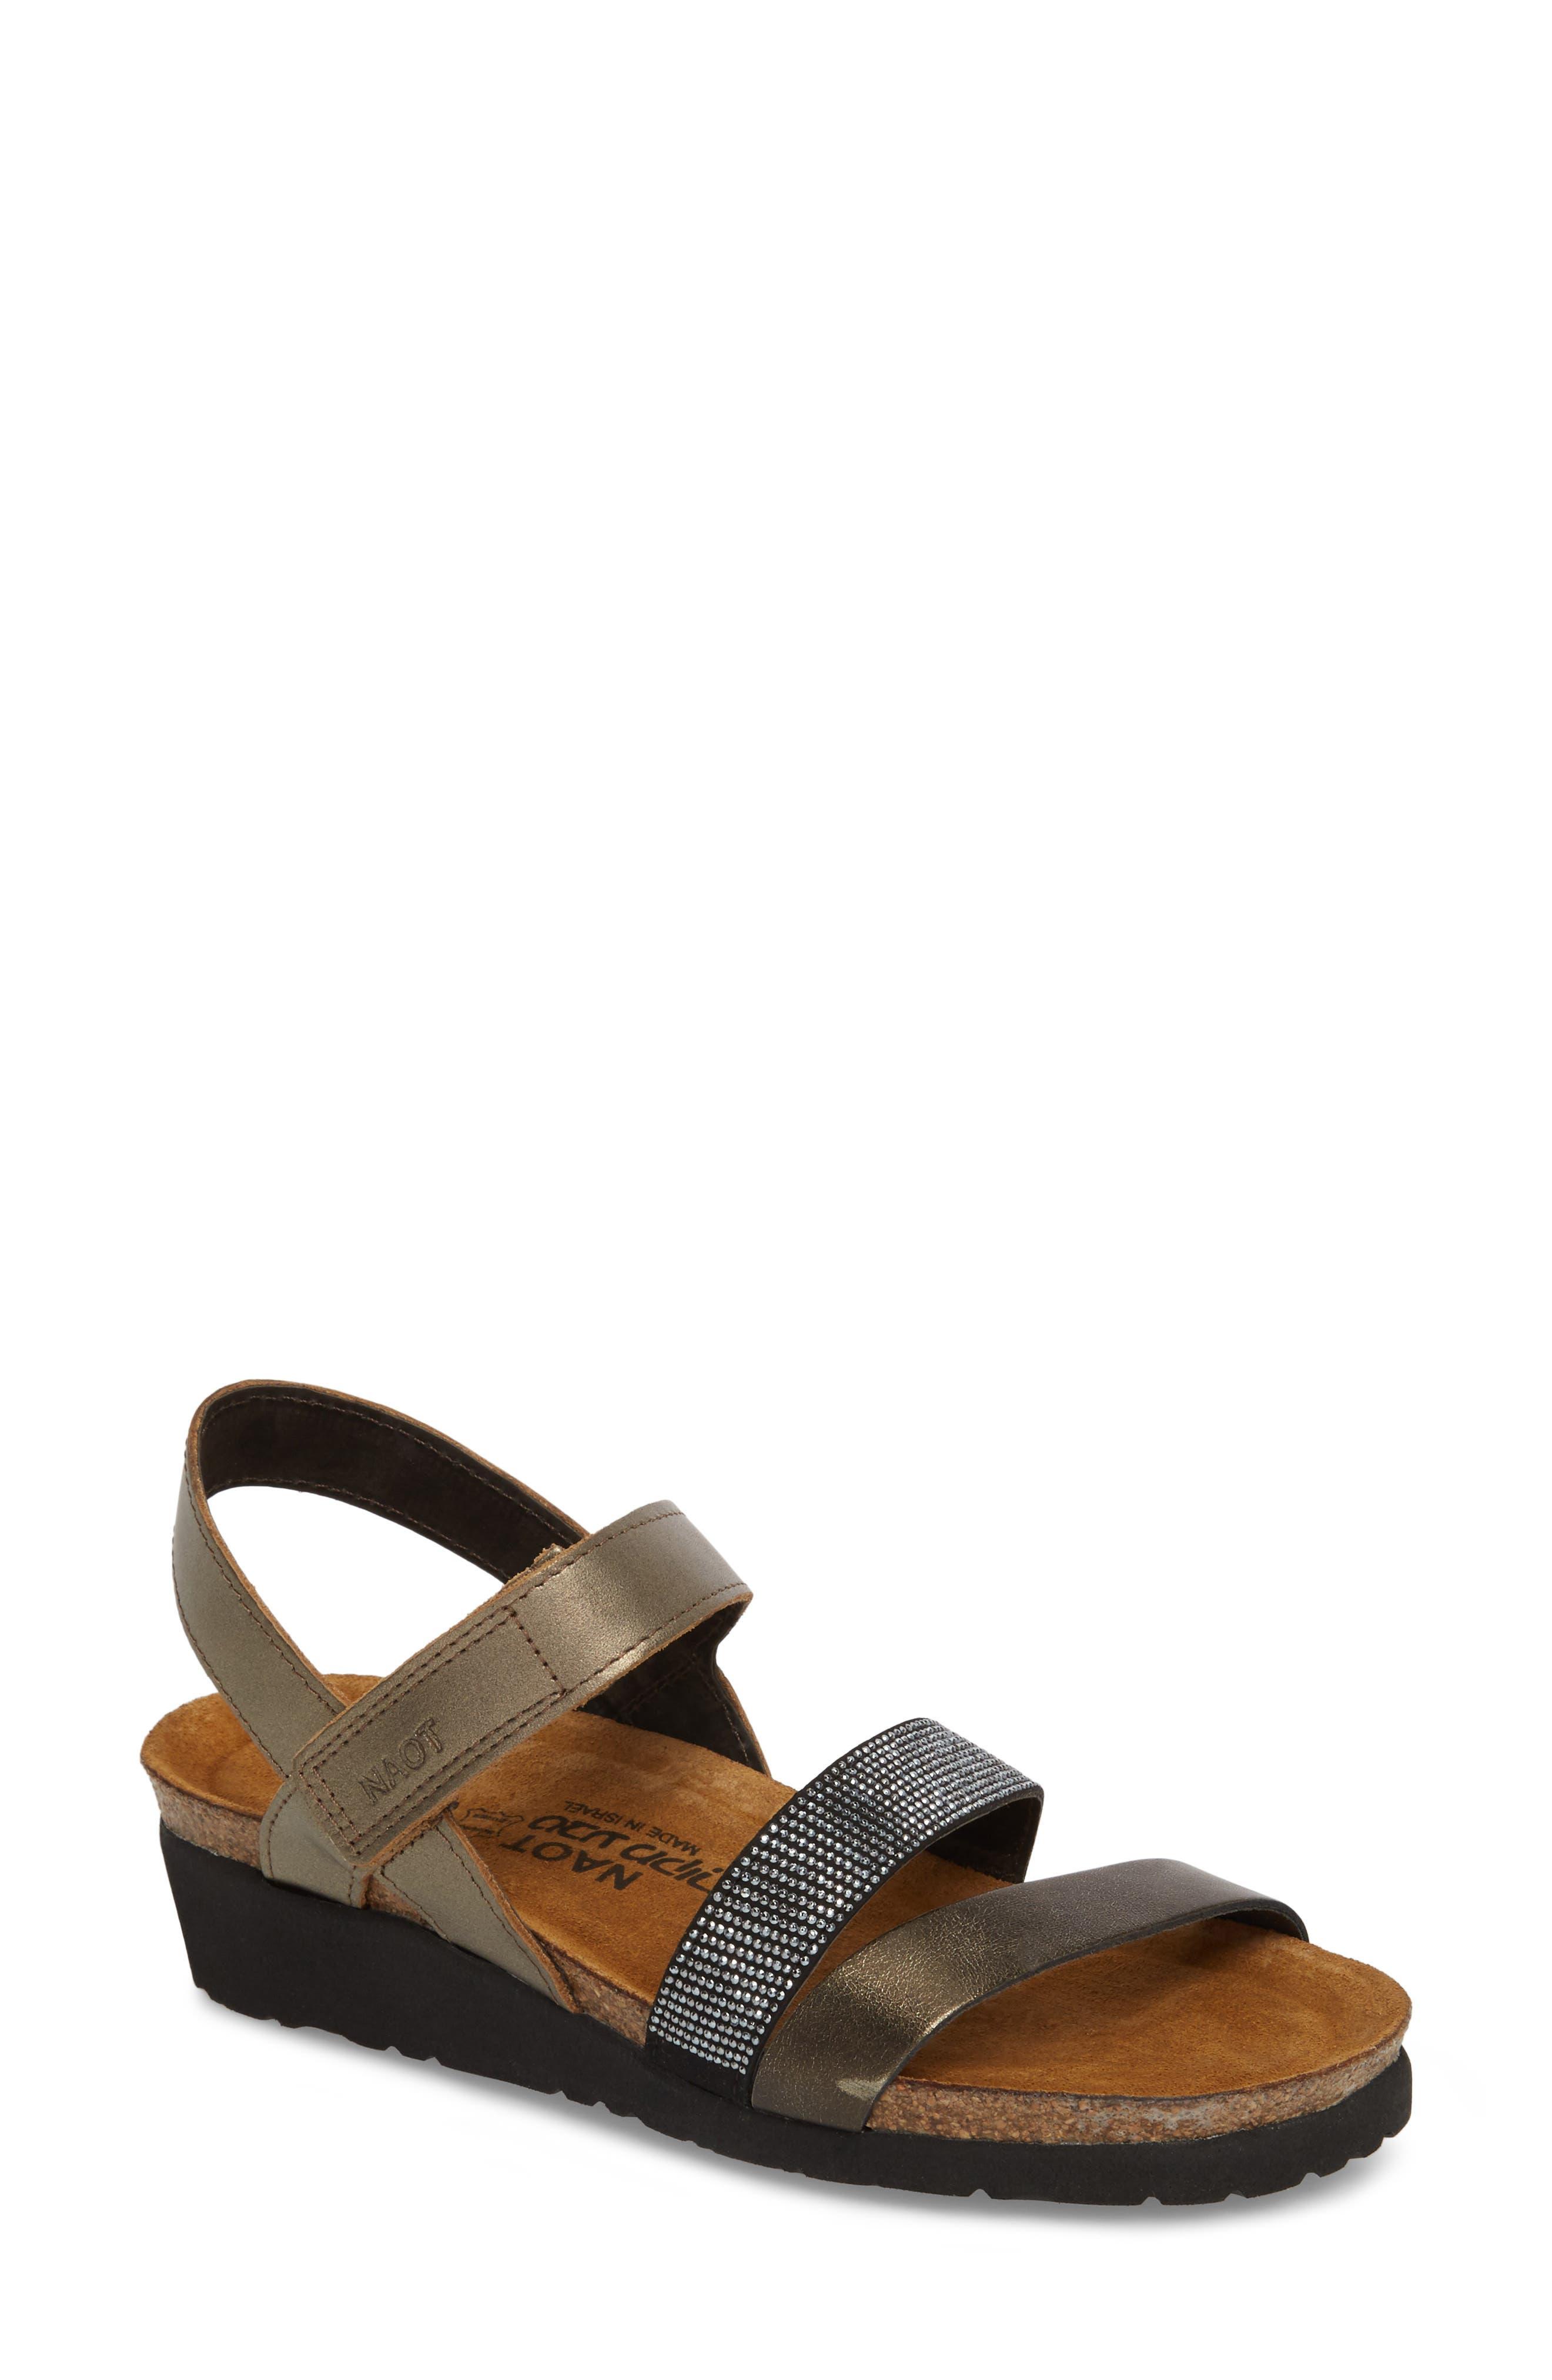 'Krista' Sandal,                         Main,                         color, PEWTER LEATHER